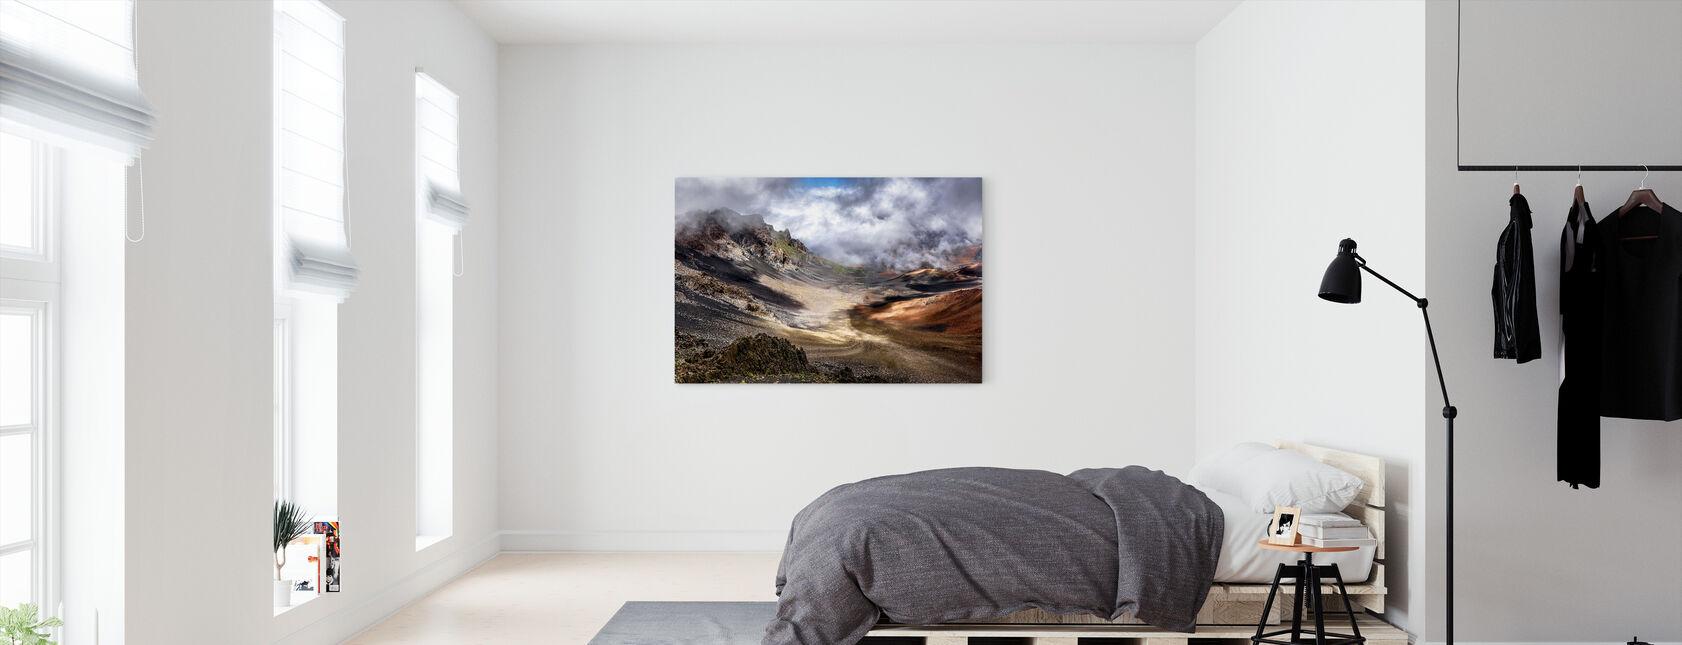 Kraatterit reuna - Canvastaulu - Makuuhuone